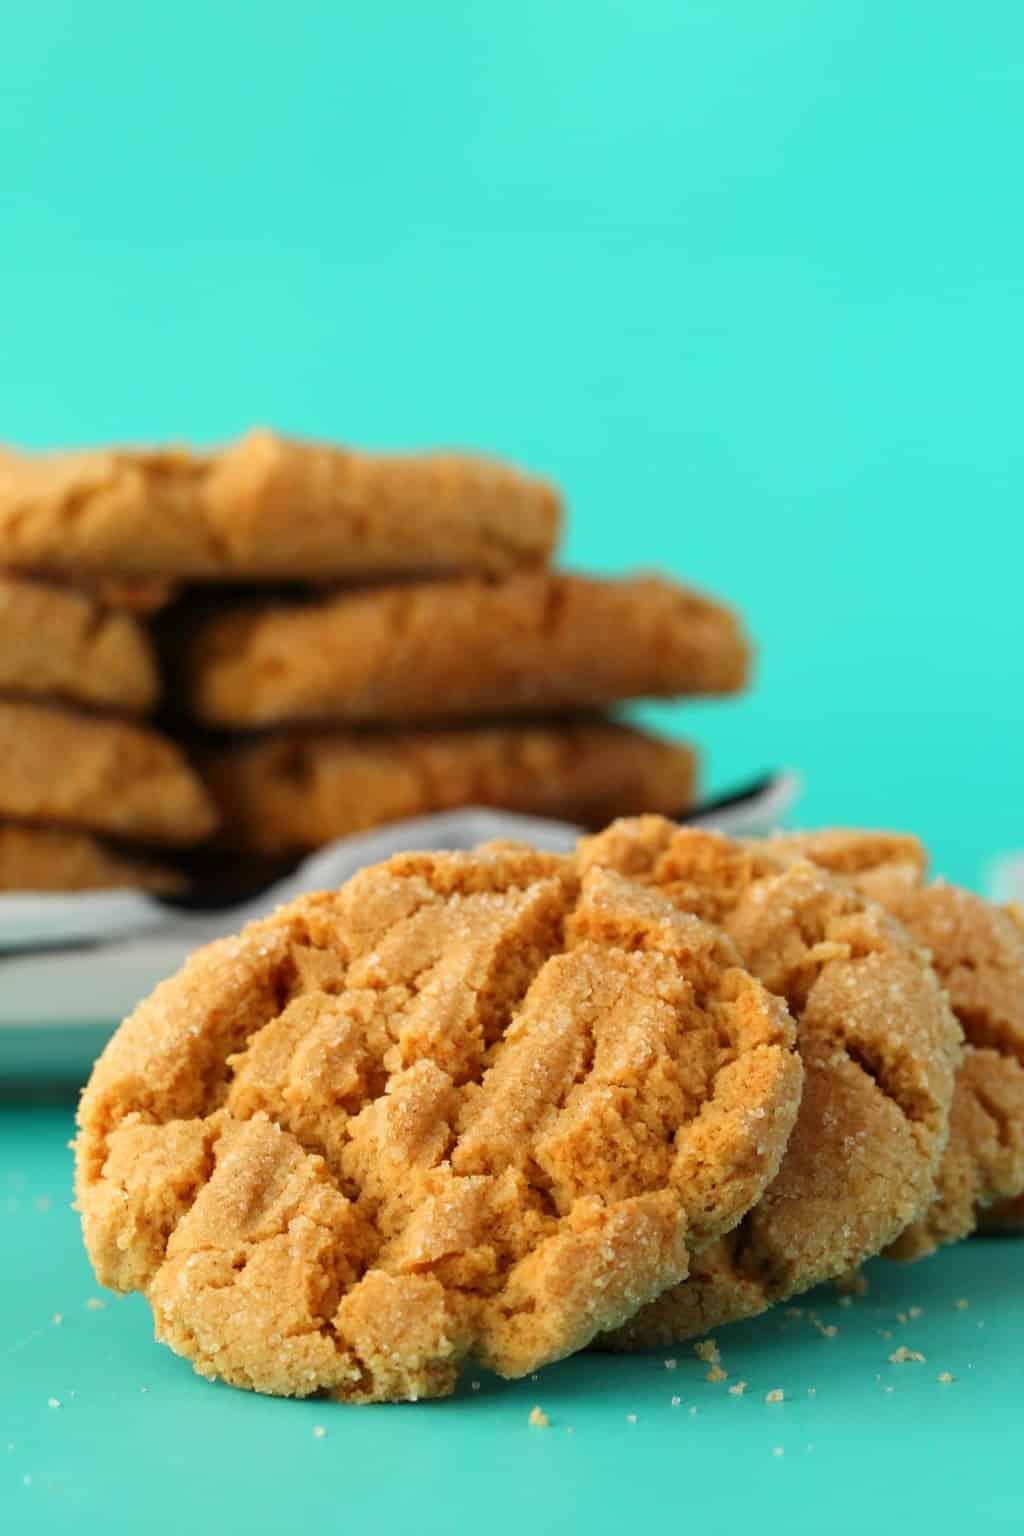 Vegan peanut butter cookies in a row.